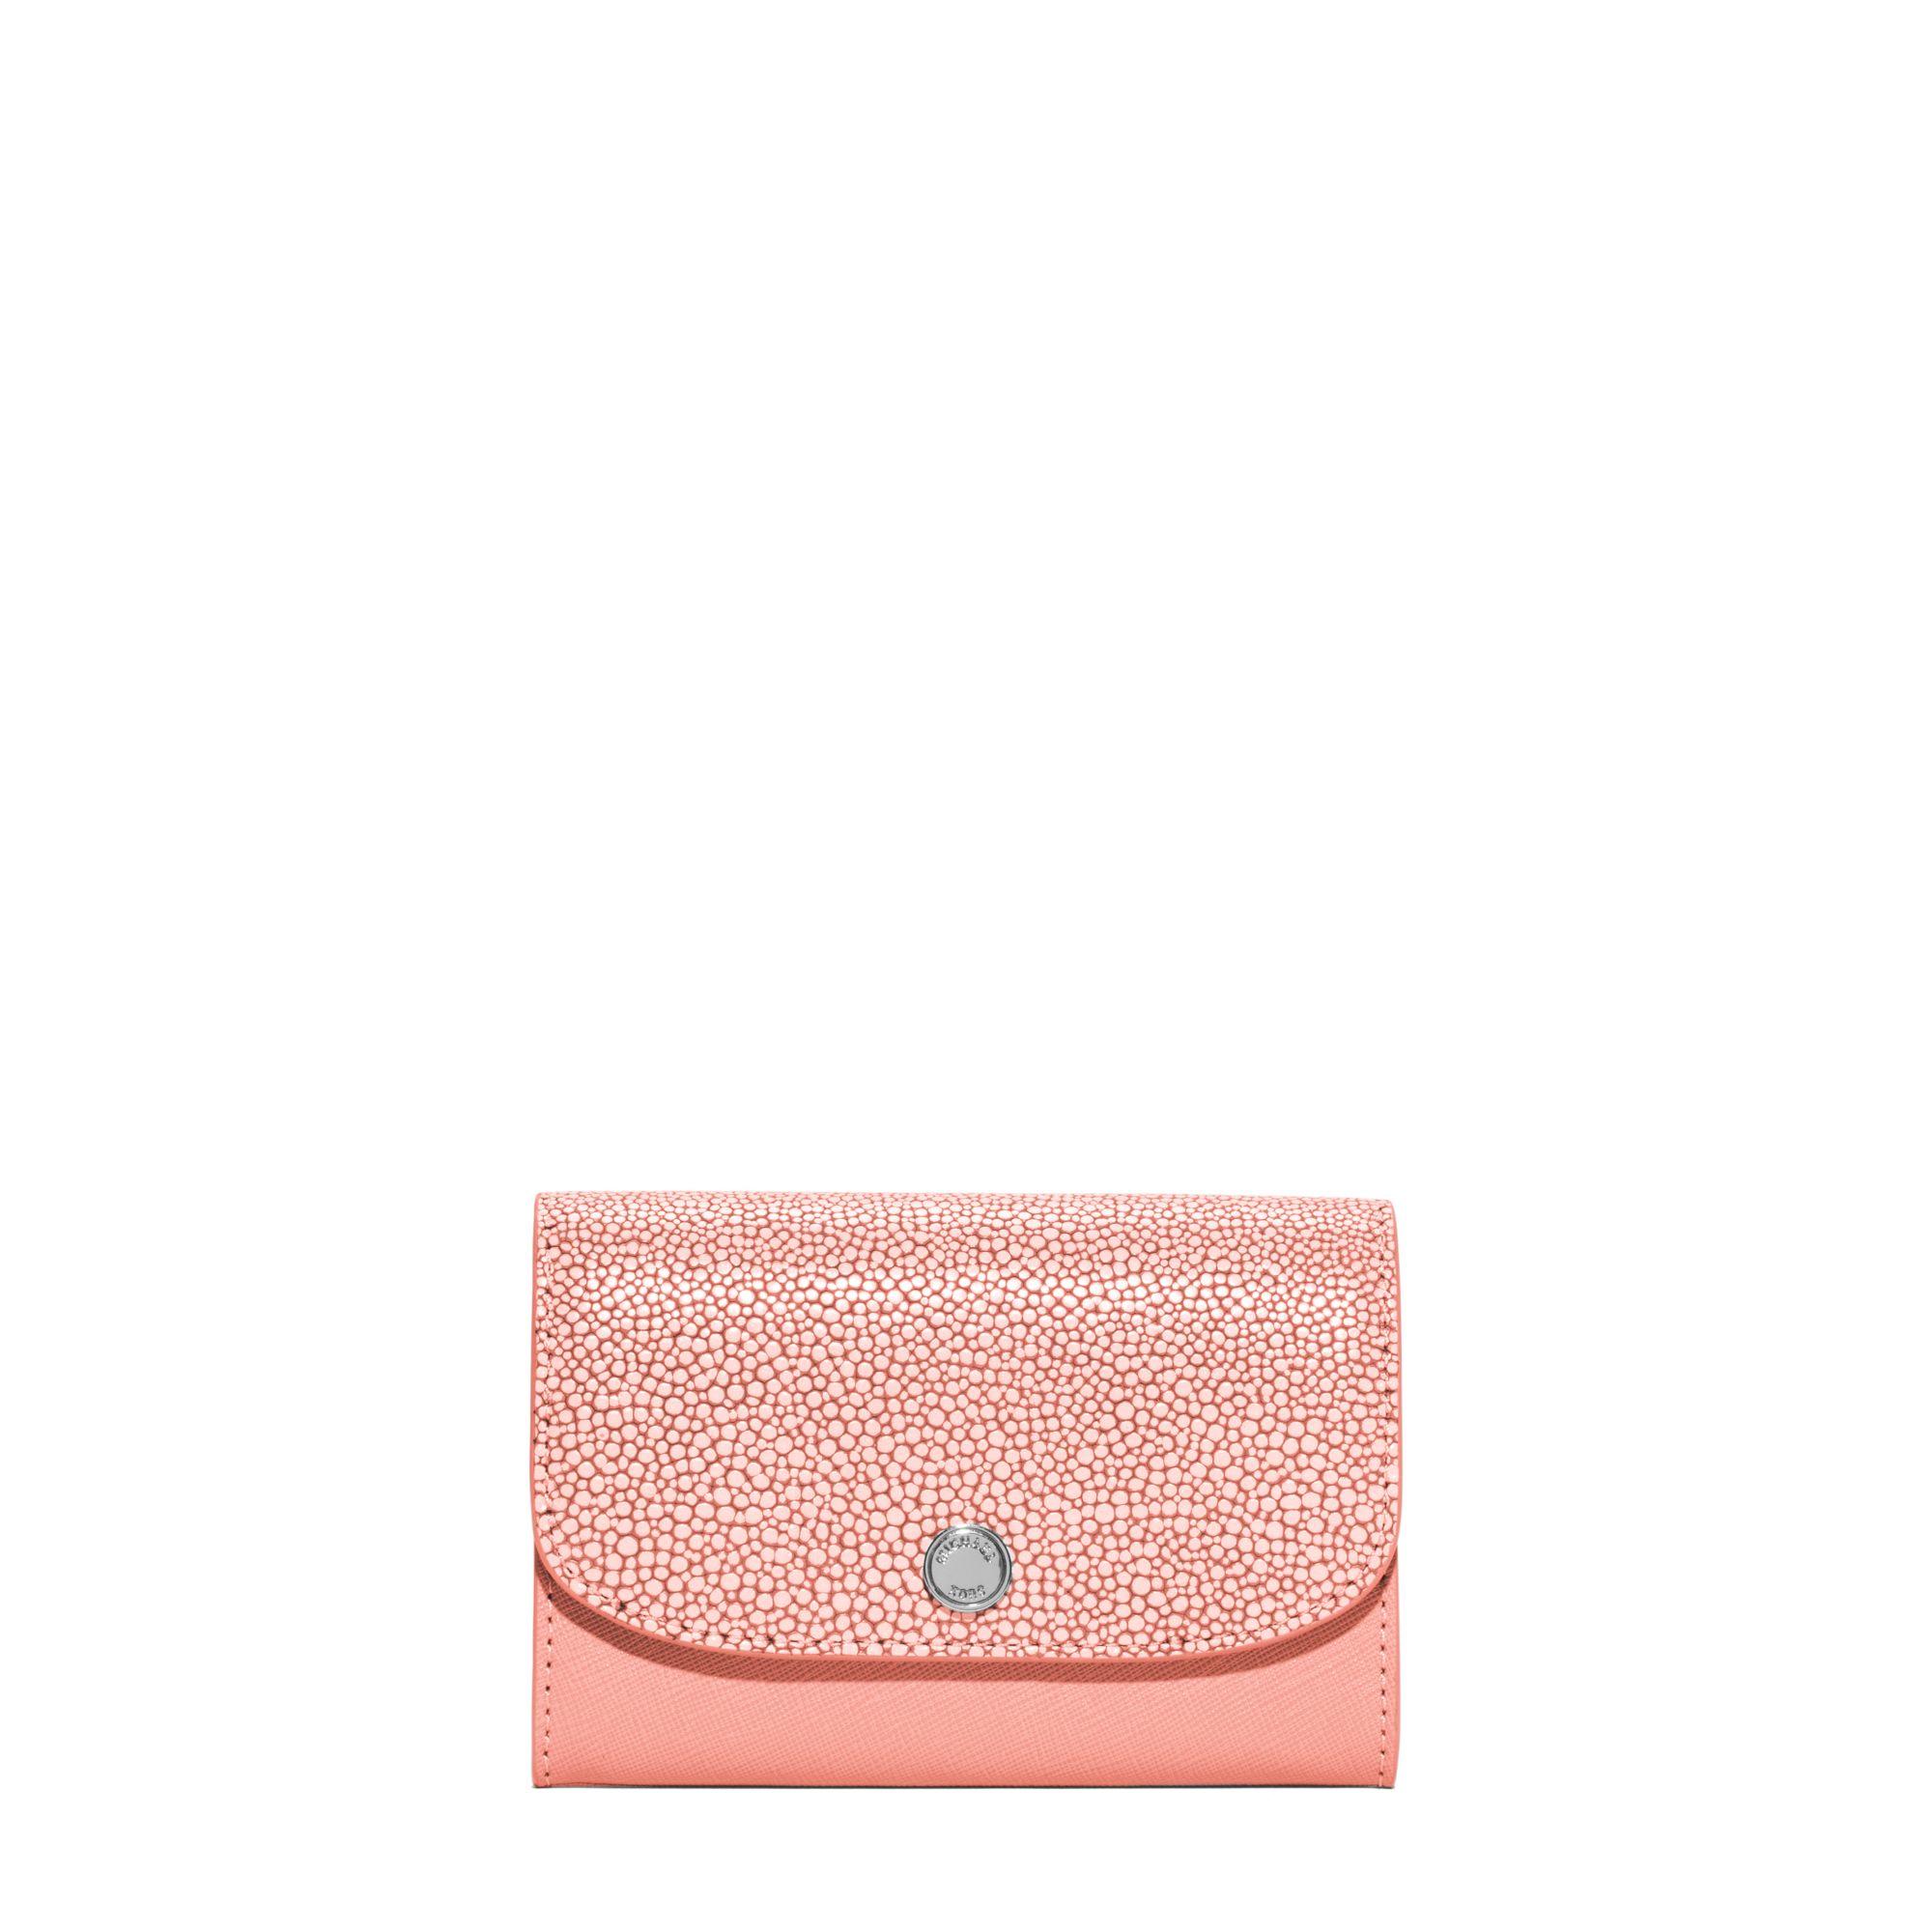 db928b5dd133 Michael Kors Juliana Medium 3-in-1 Saffiano Leather Wallet in Pink ...